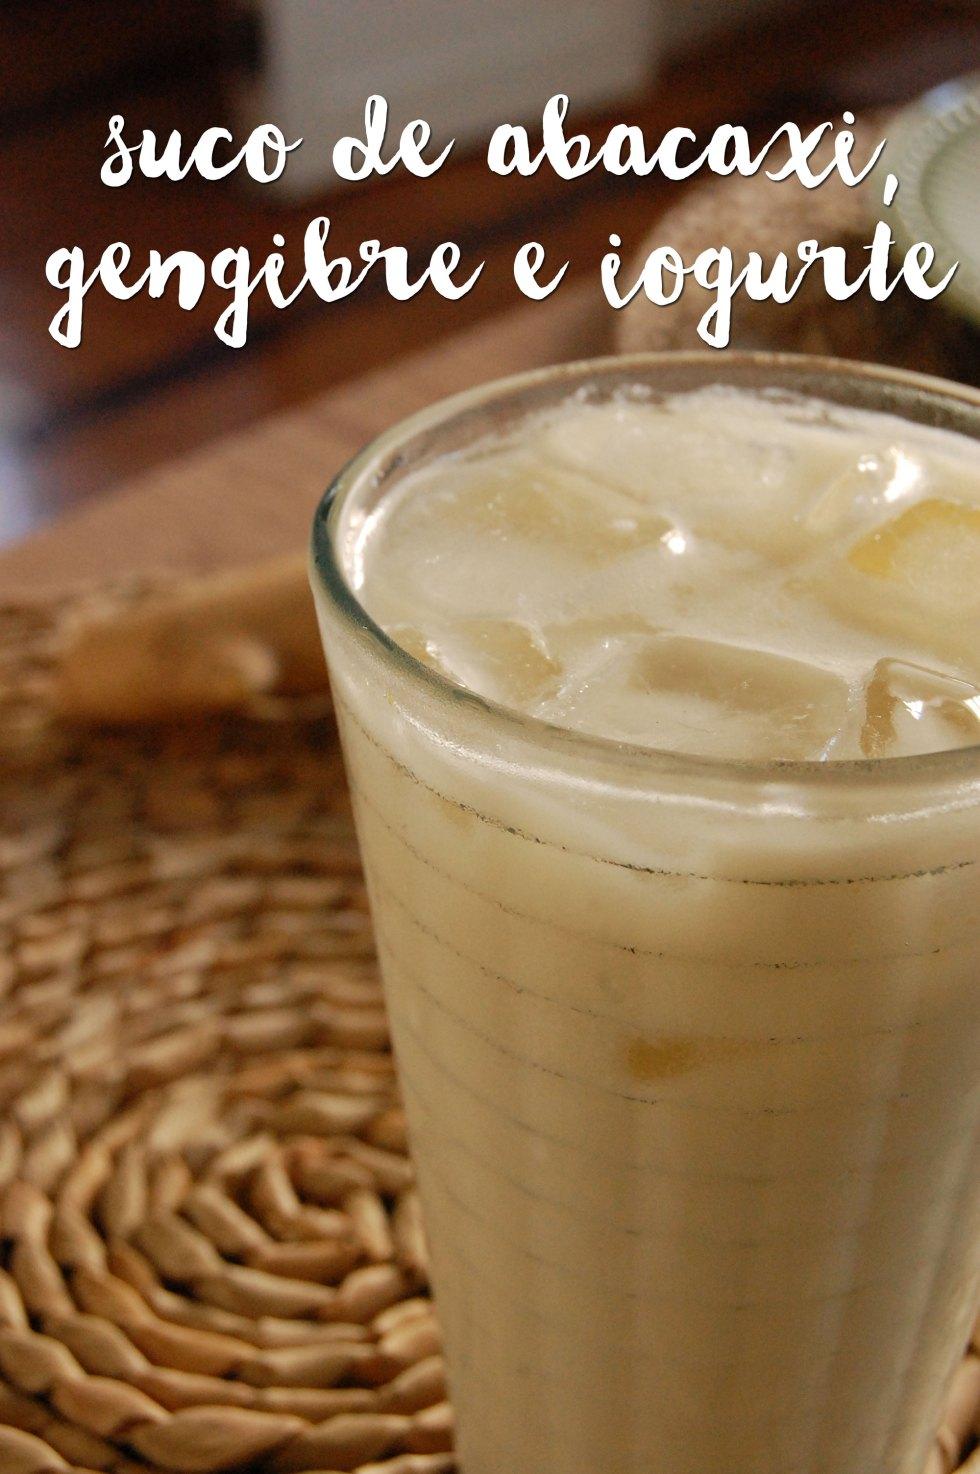 Suco de Abacaxi, iogurte e gengibre 2